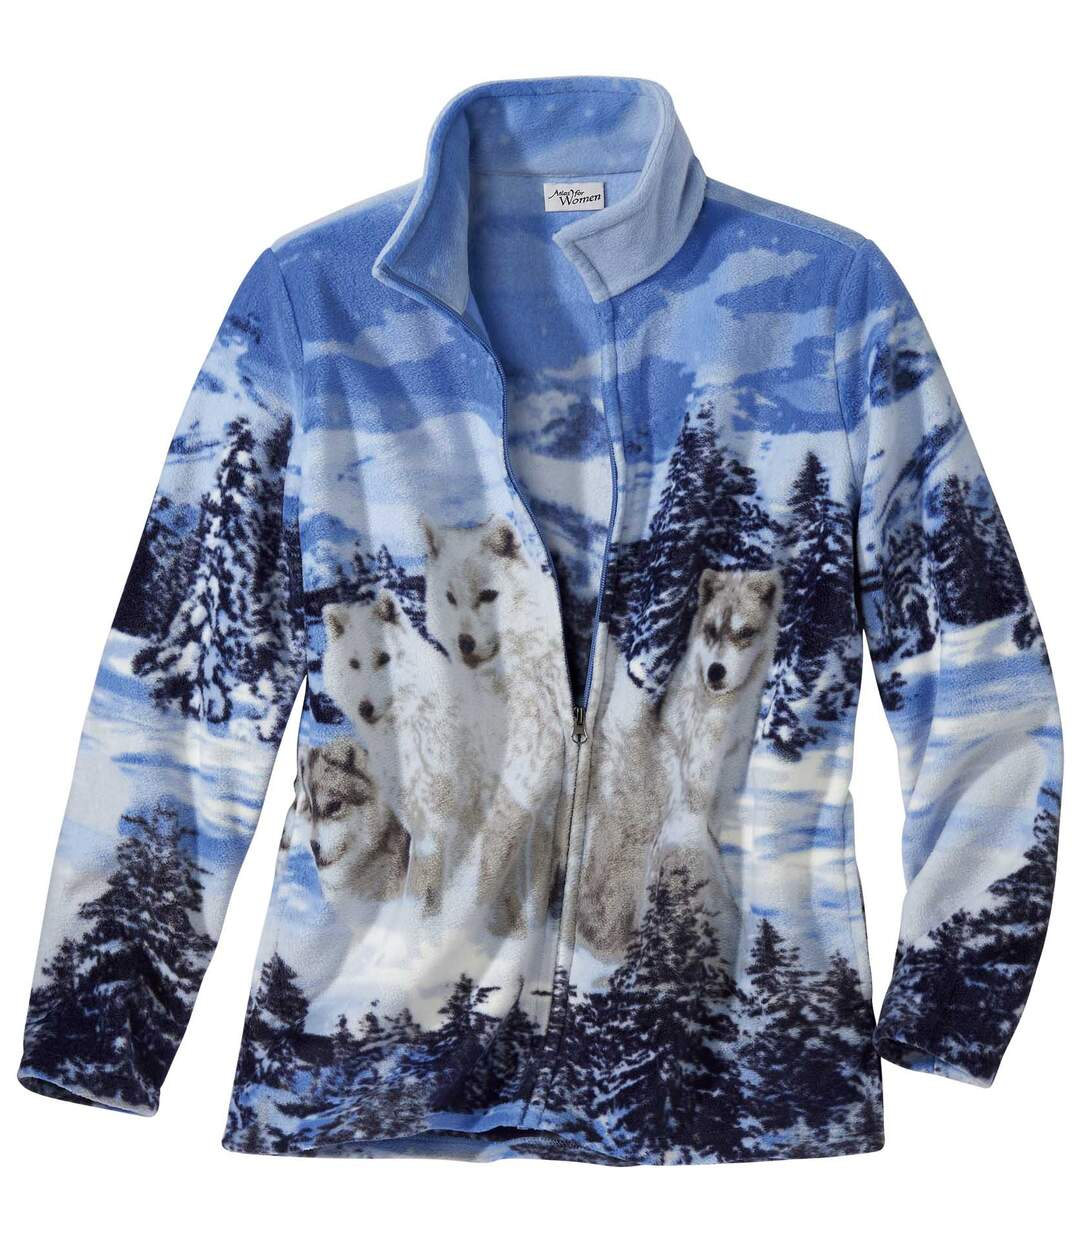 Fleece-Jacke mit Wolfsmotiv